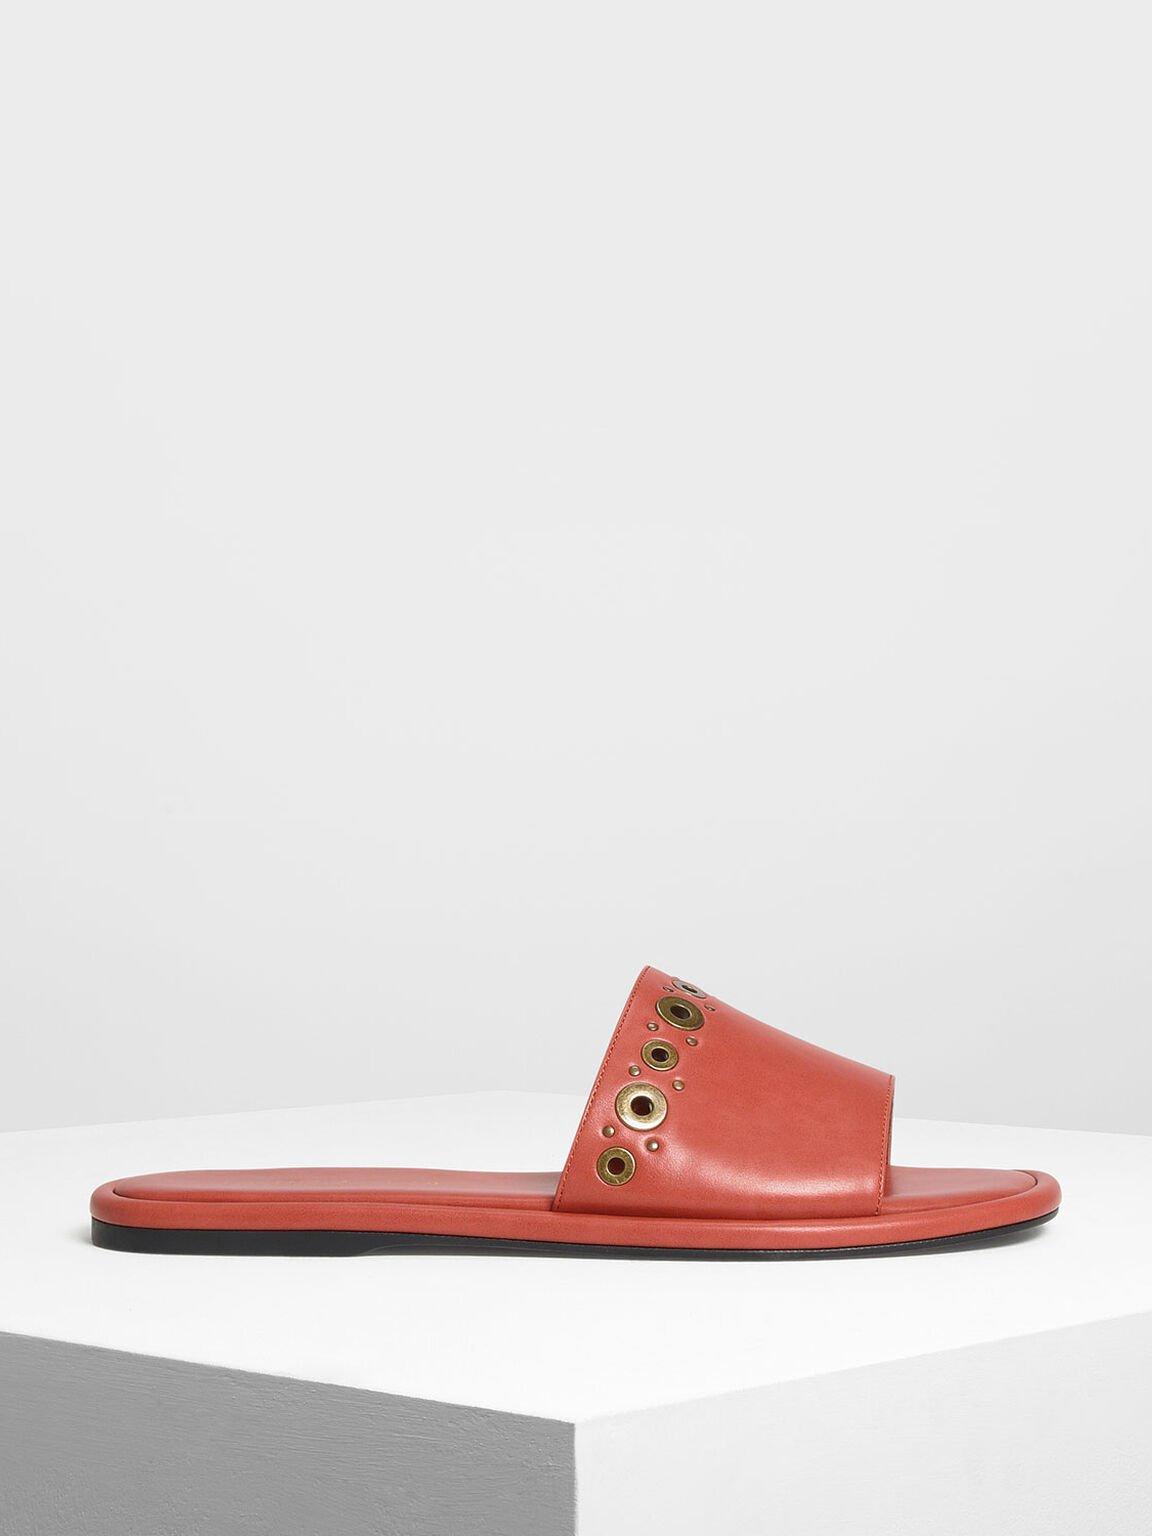 圓孔平底拖鞋, 橘色, hi-res